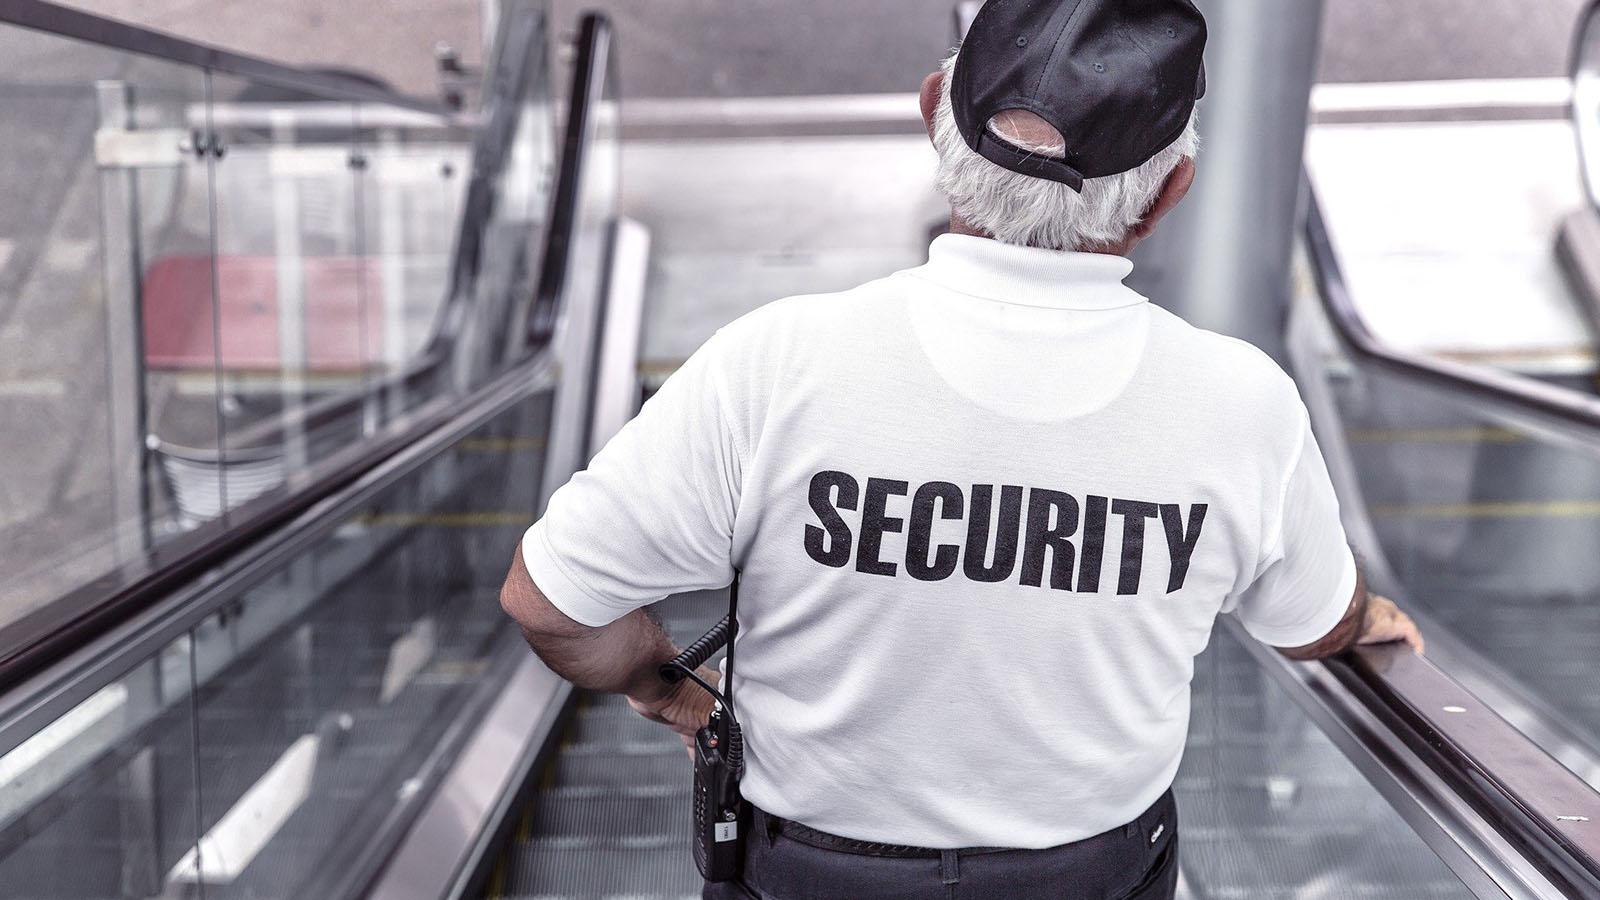 securite-notredamedemonts-vendee